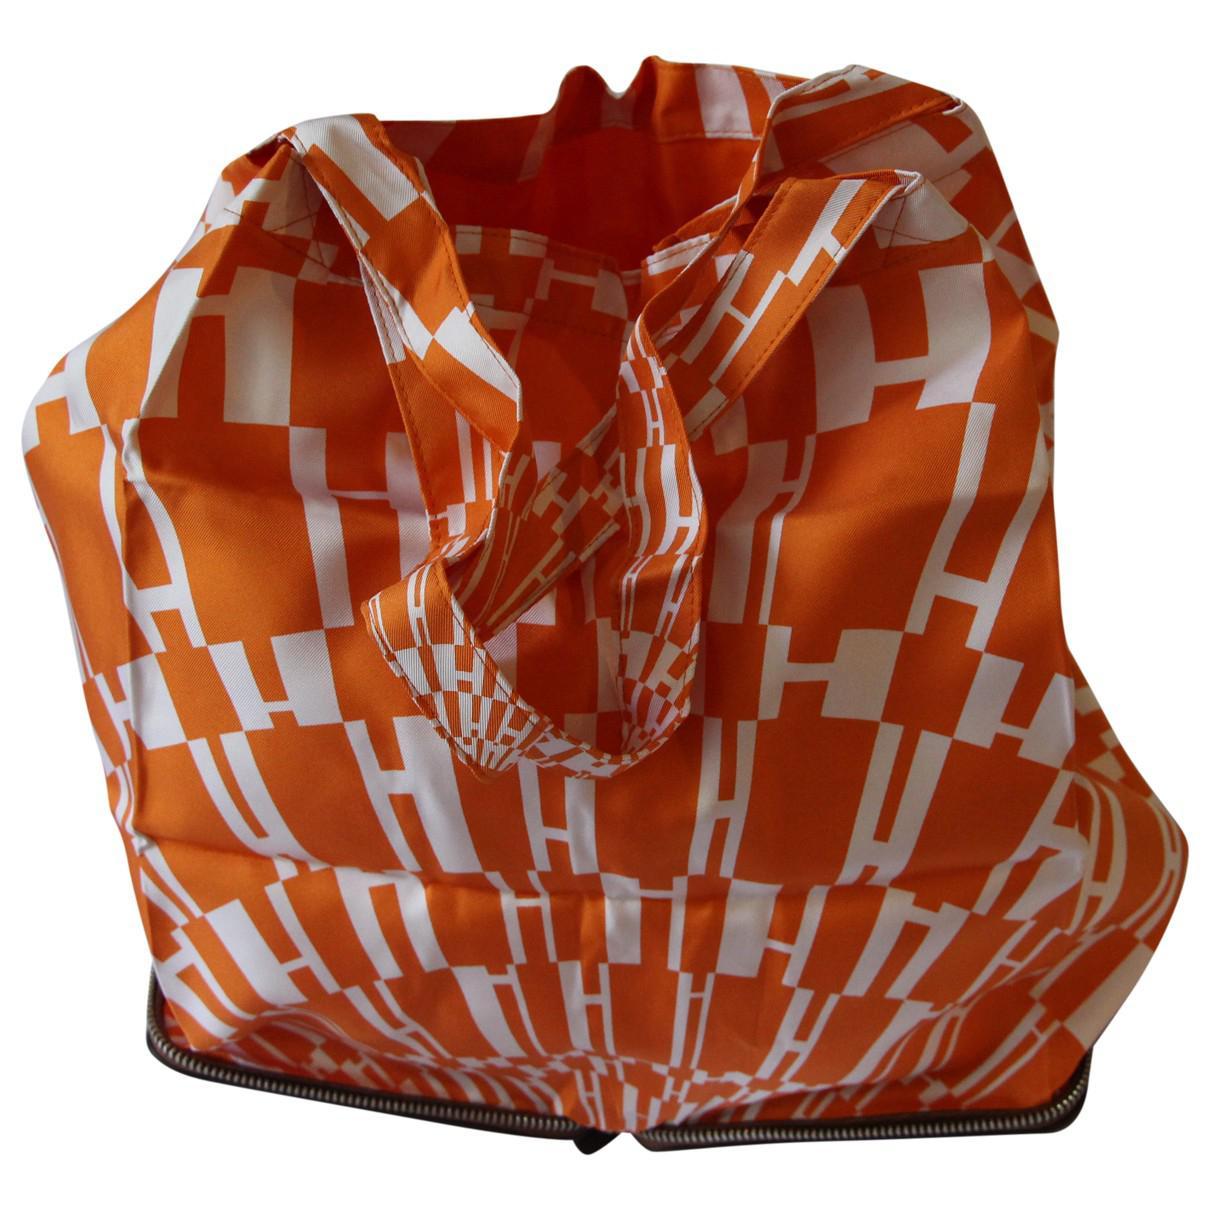 d16f47463456 Hermès Silky Pop Silk Tote in Orange - Lyst